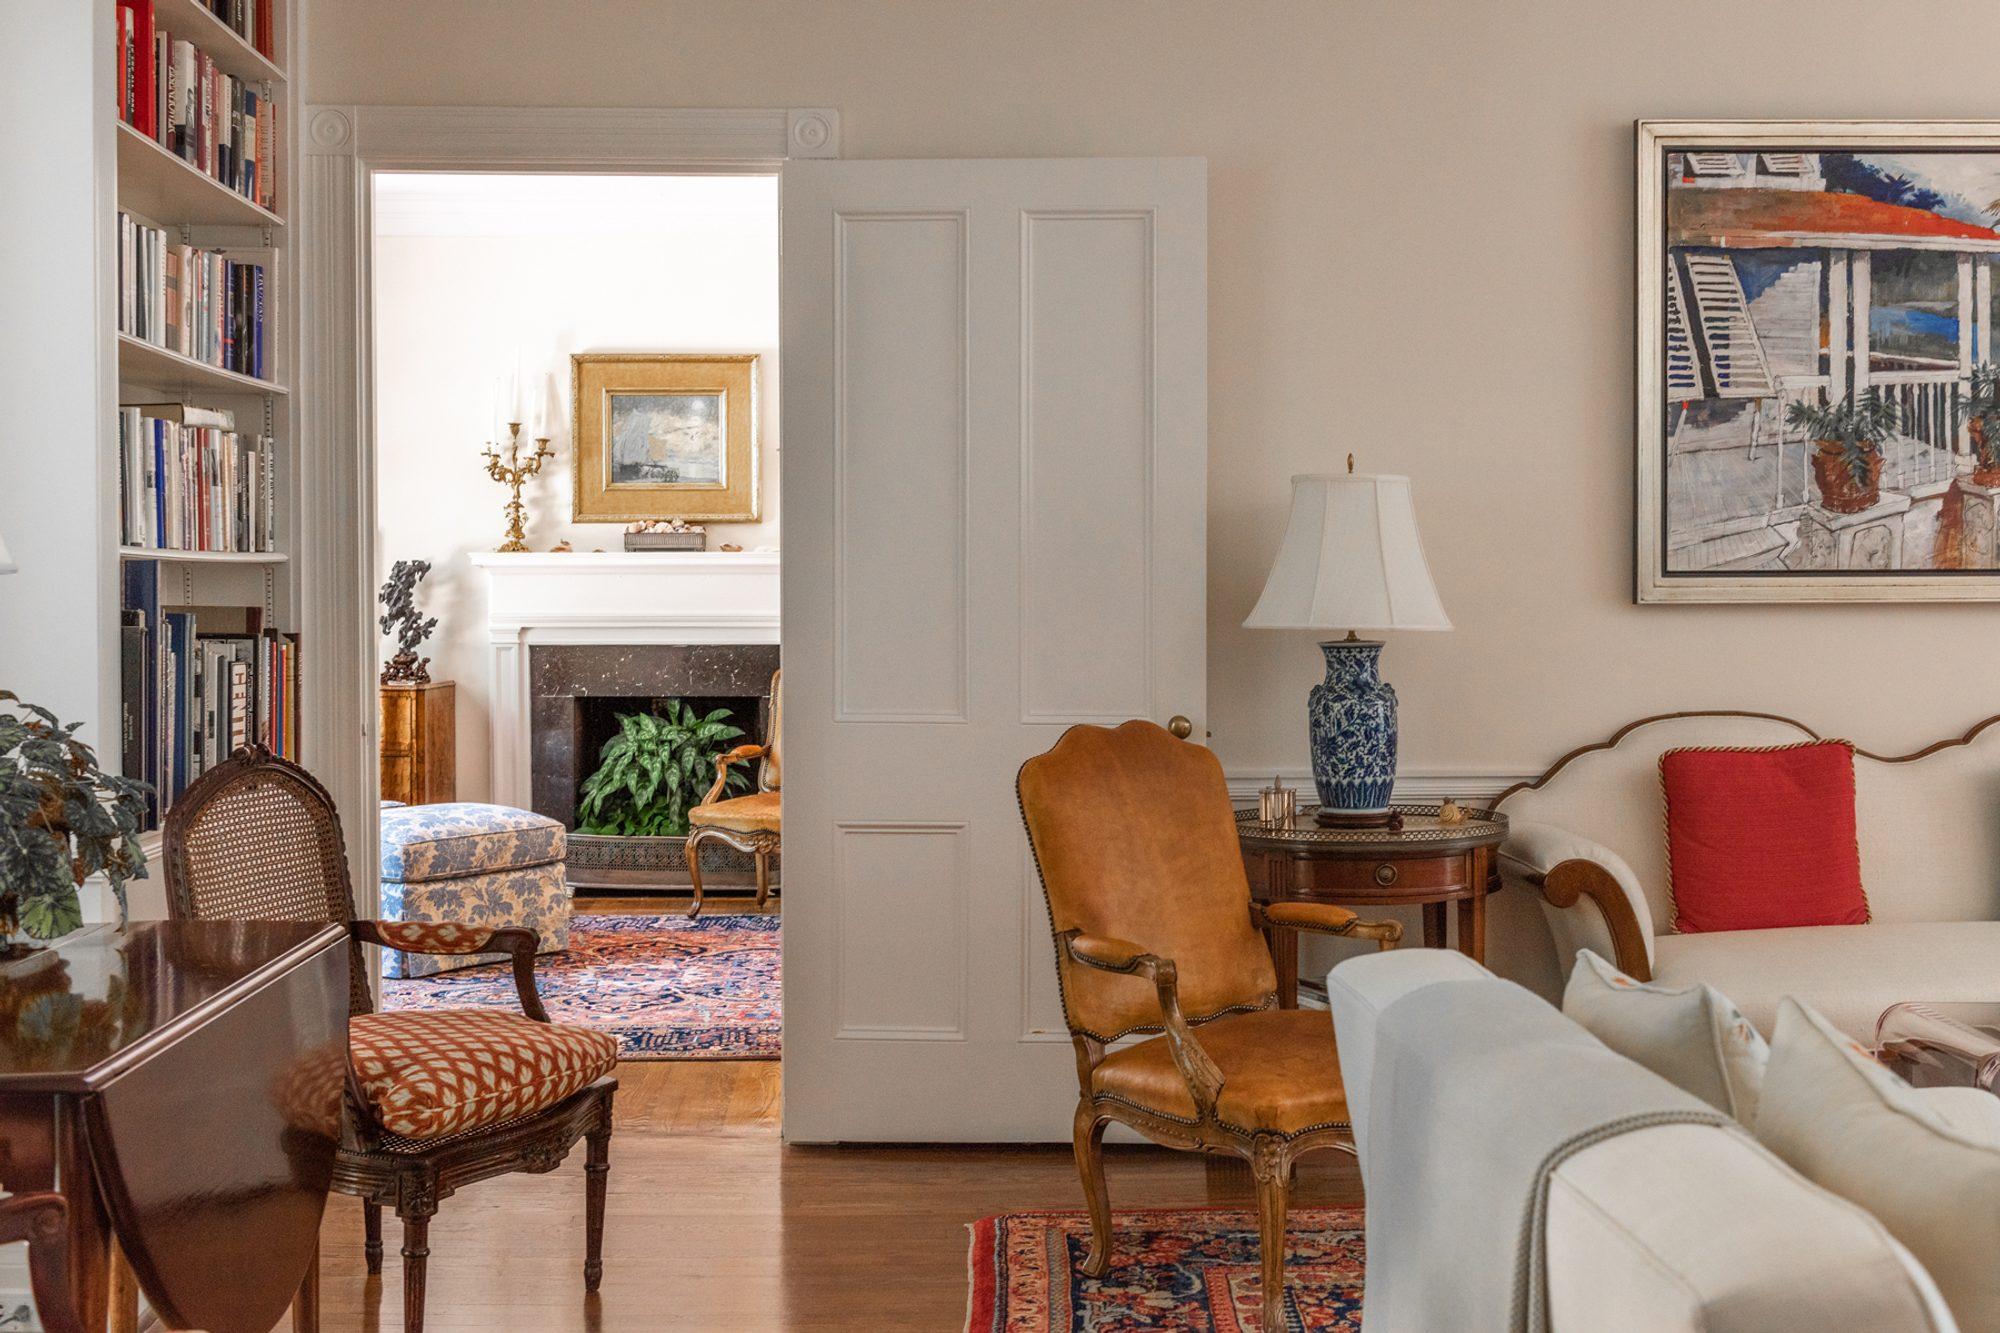 Beautiful home with medium golden brown hardwood floors throughout.